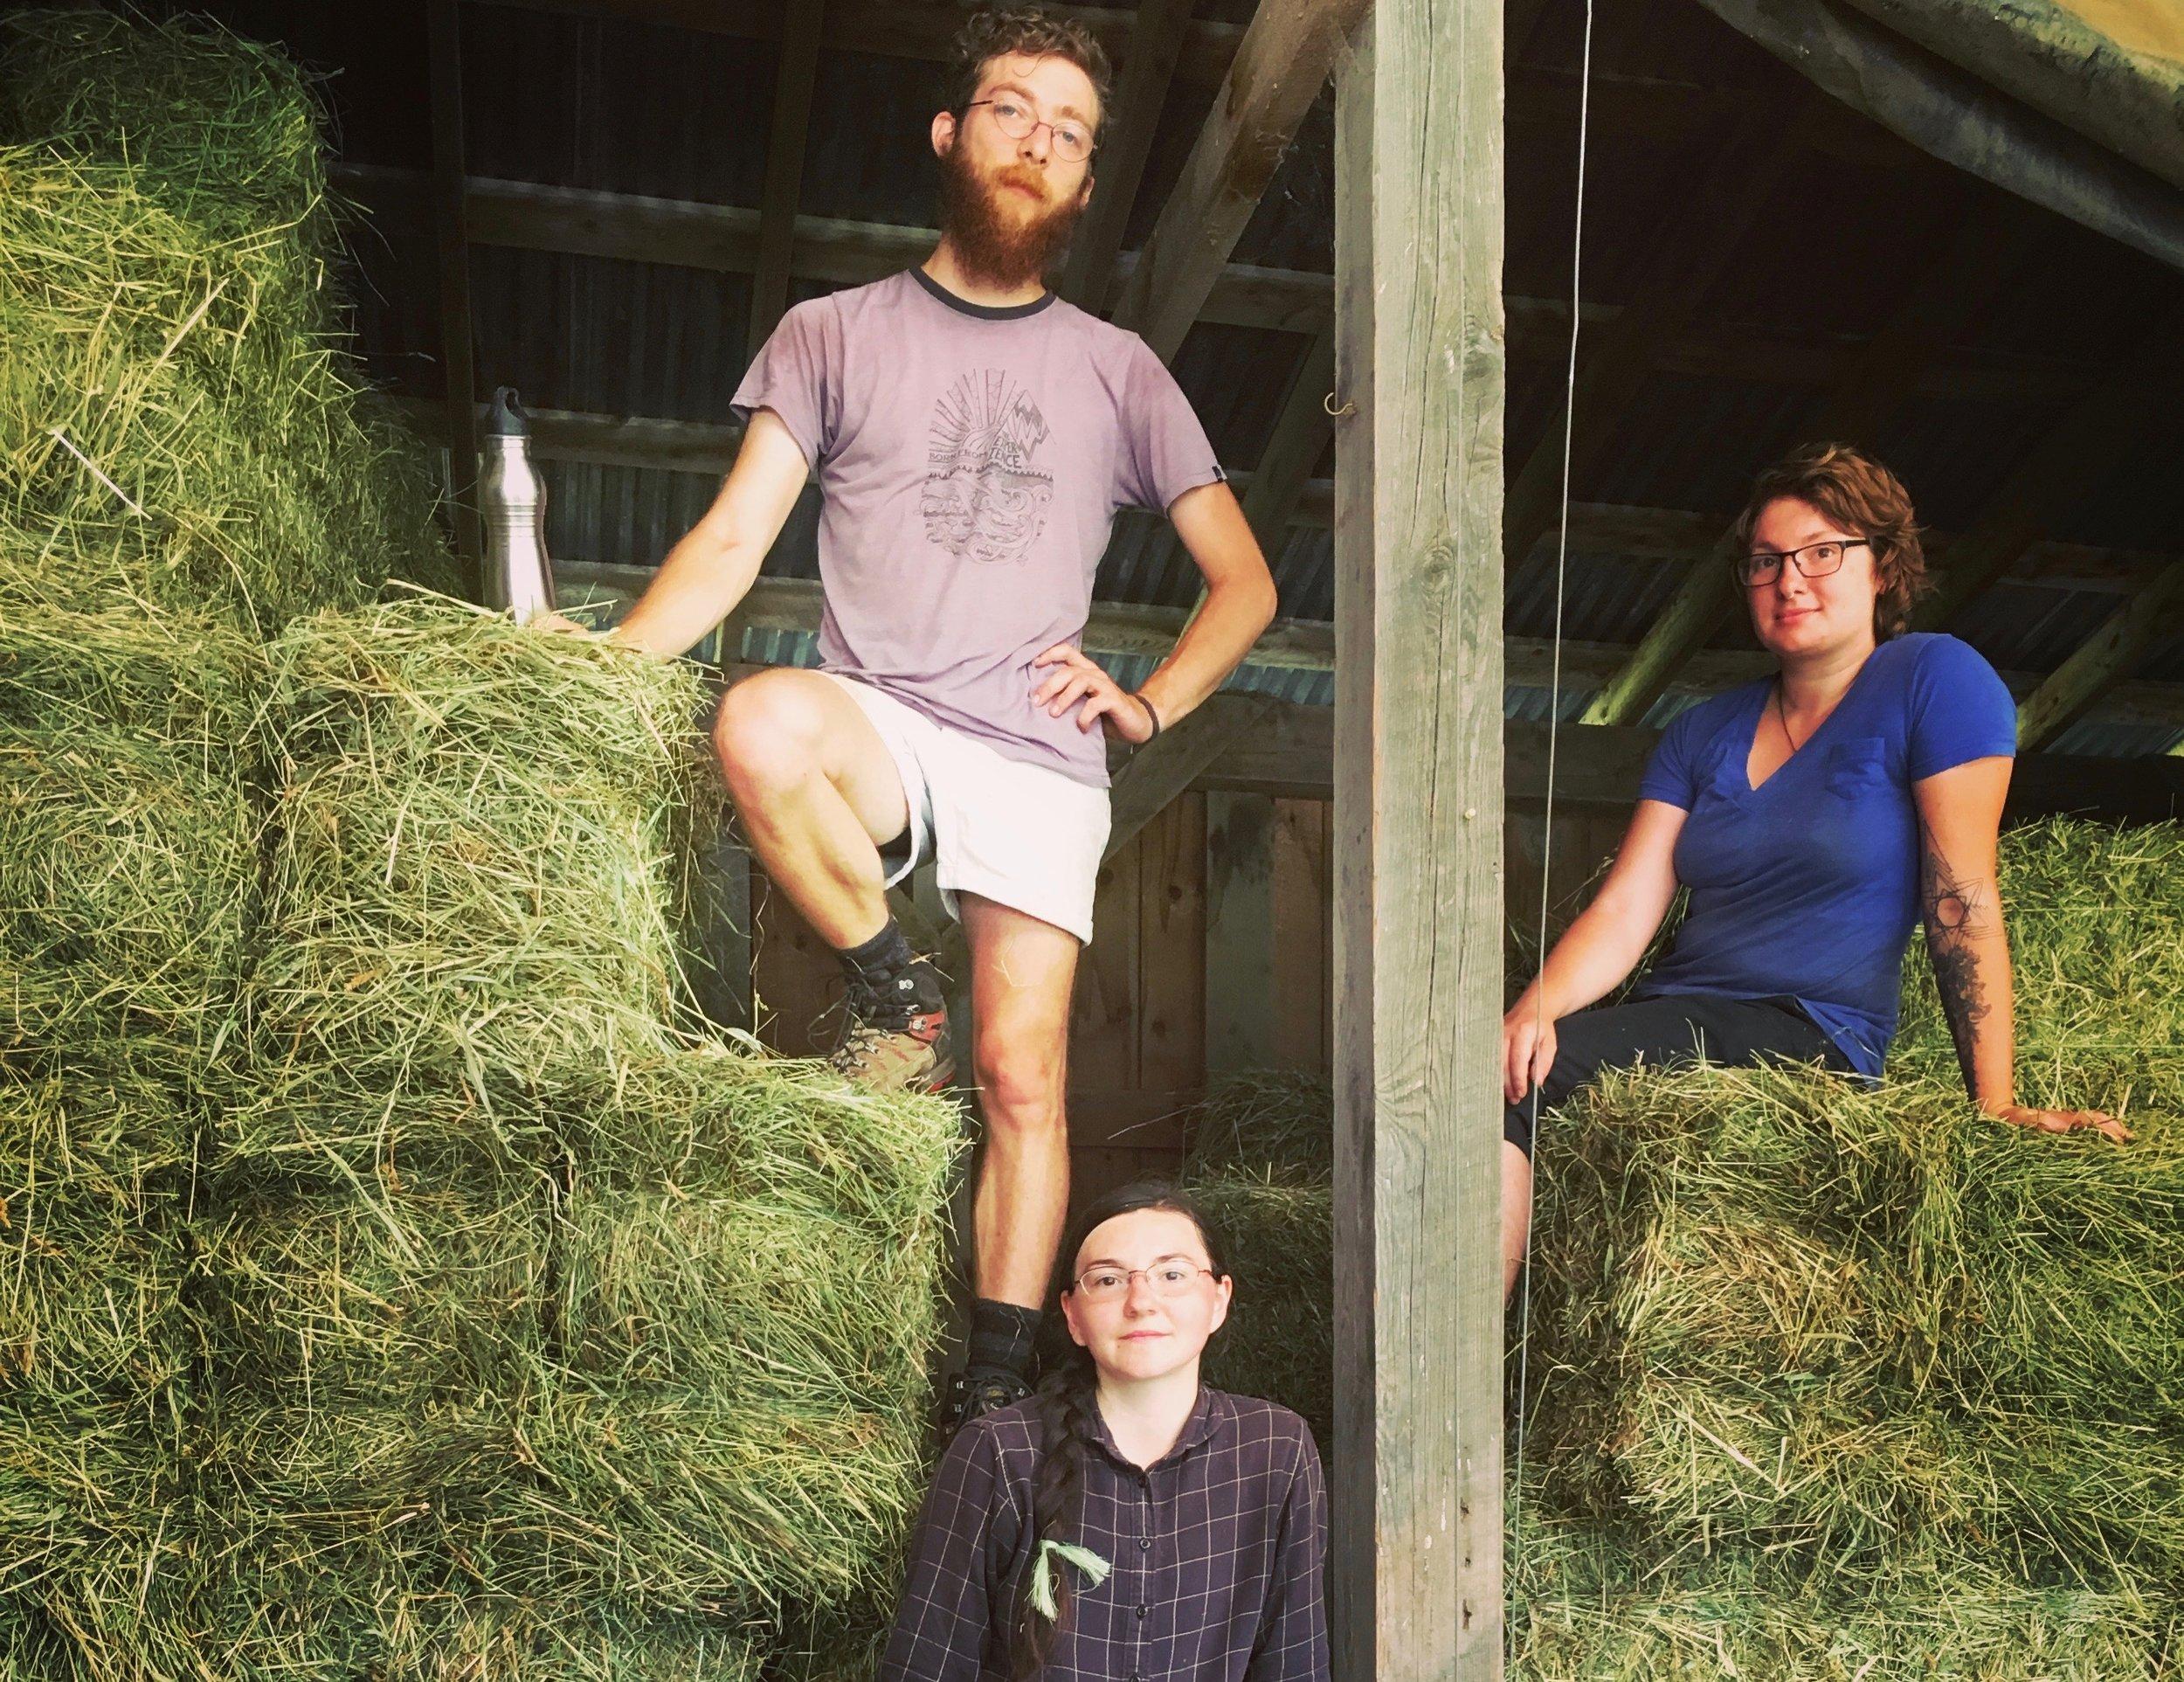 interns on hay loft.JPG